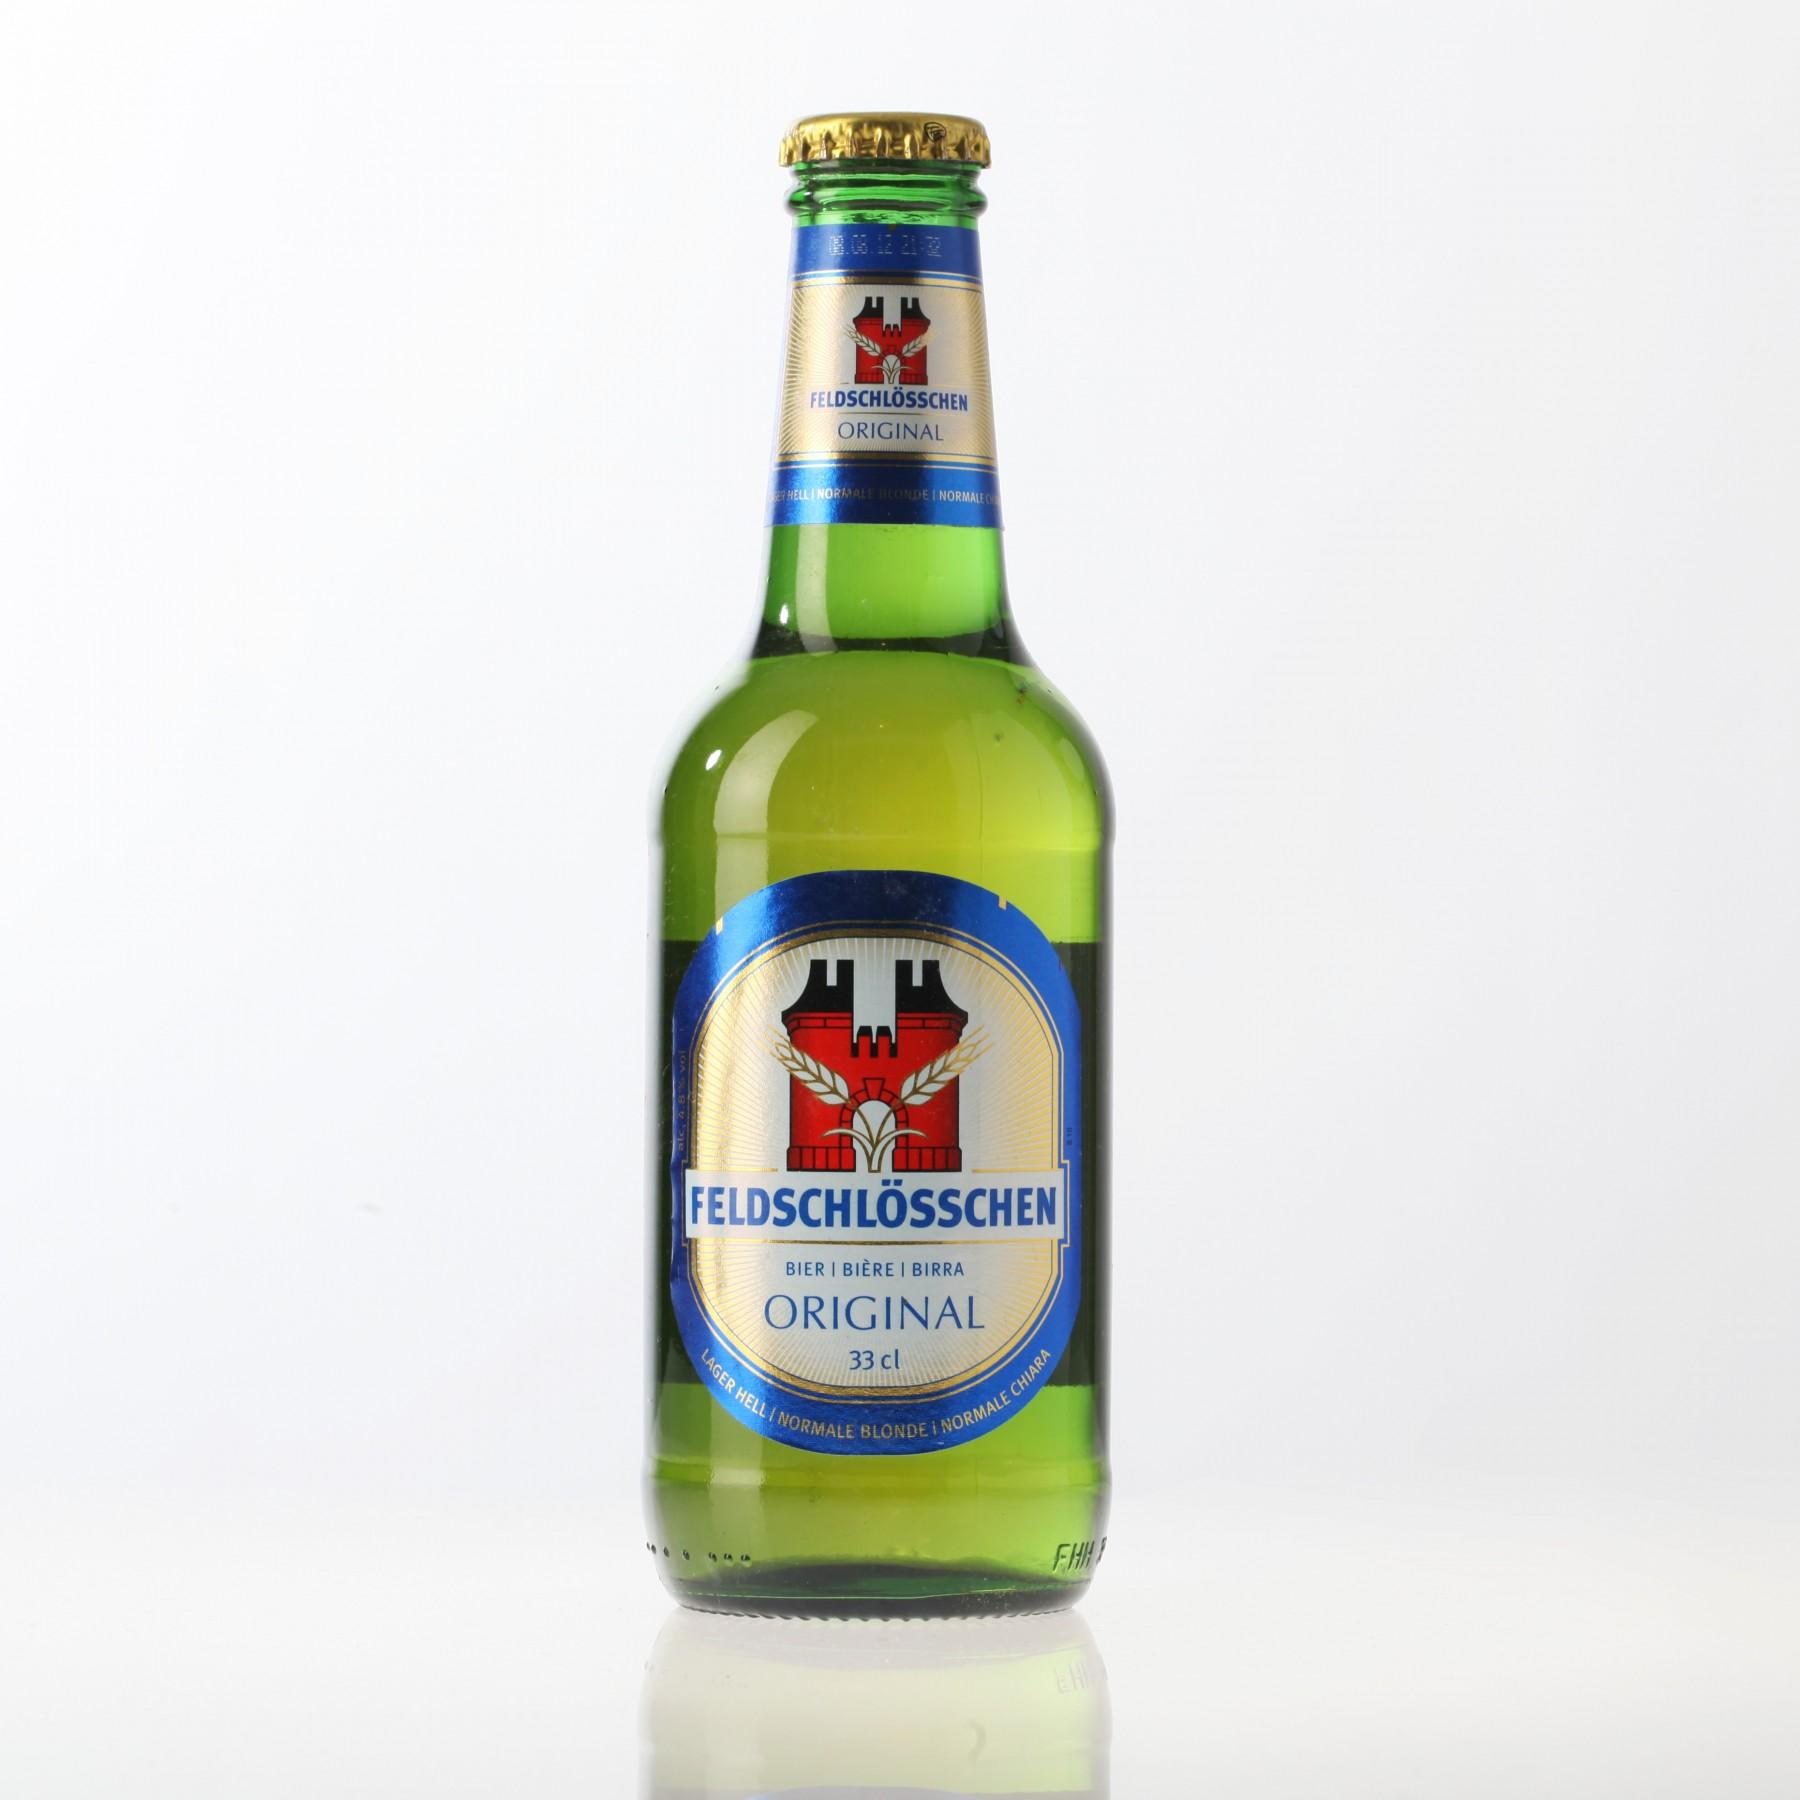 Feldschlösschen Original Premium Lager Beer (10 x 33 CL)